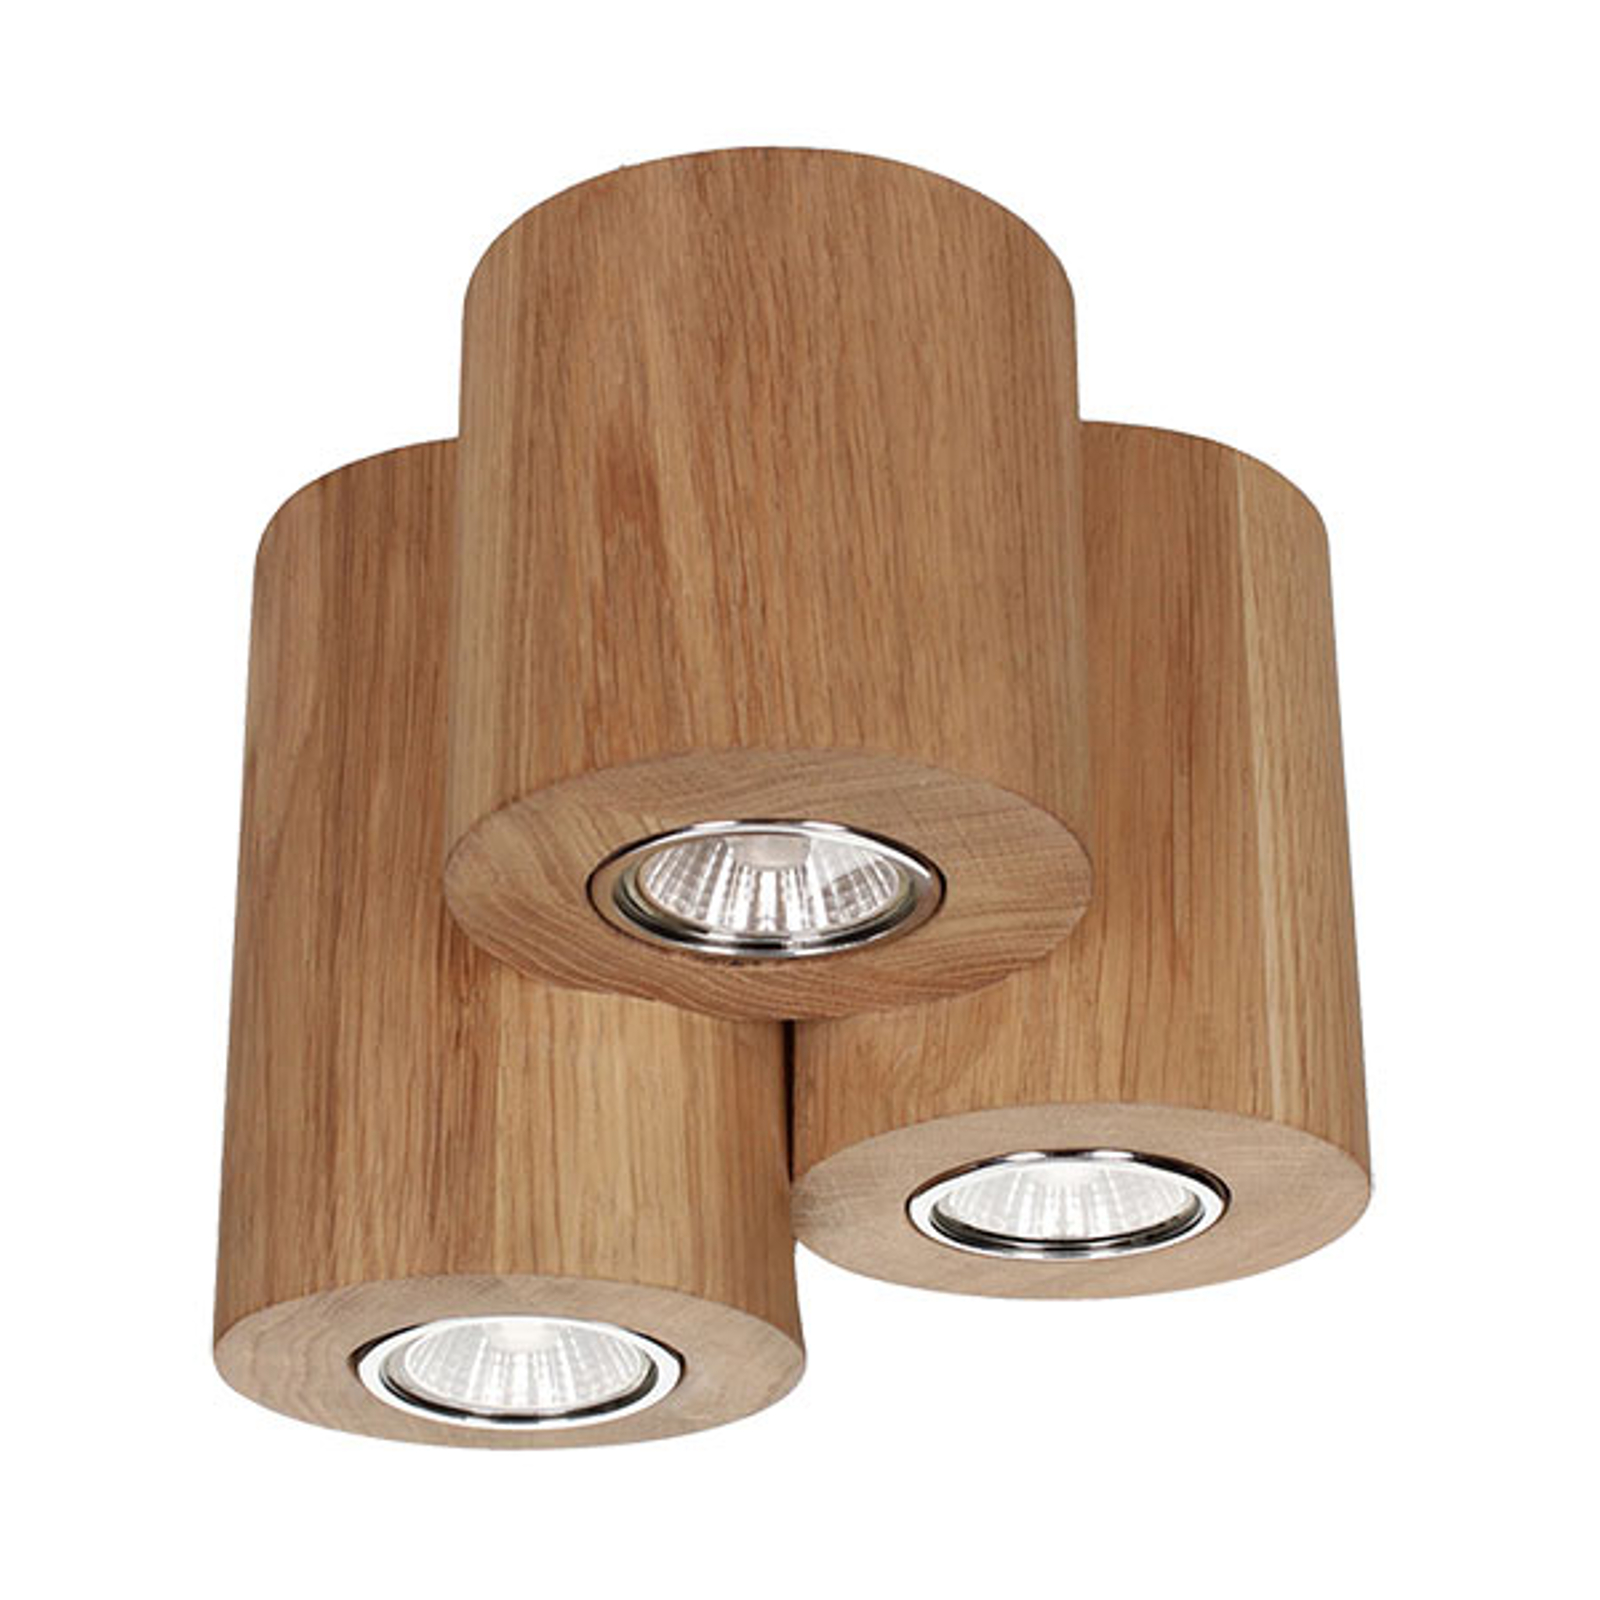 Plafonnier Wooddream à 3 lampes, chêne, rond